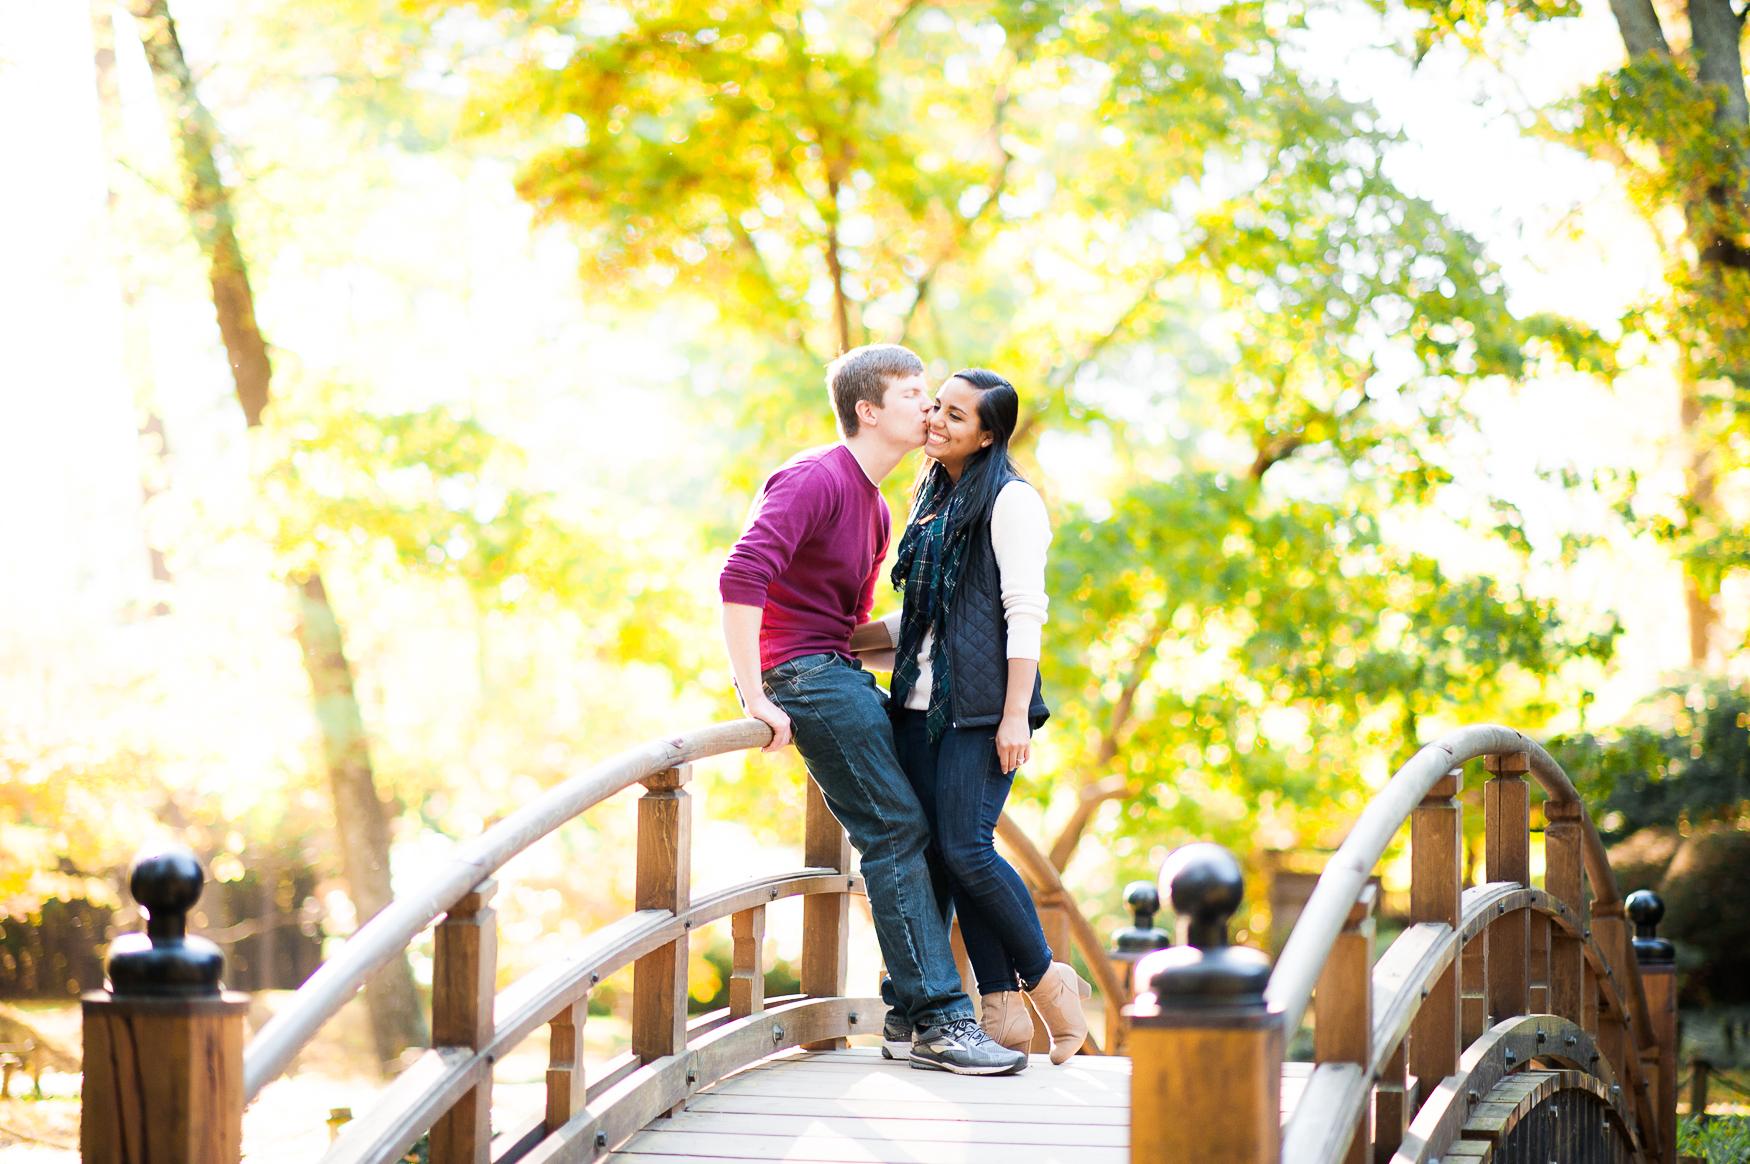 Fall_engagement_maymont_virginiawedding_youseephotography_CatherineCody (25).jpg